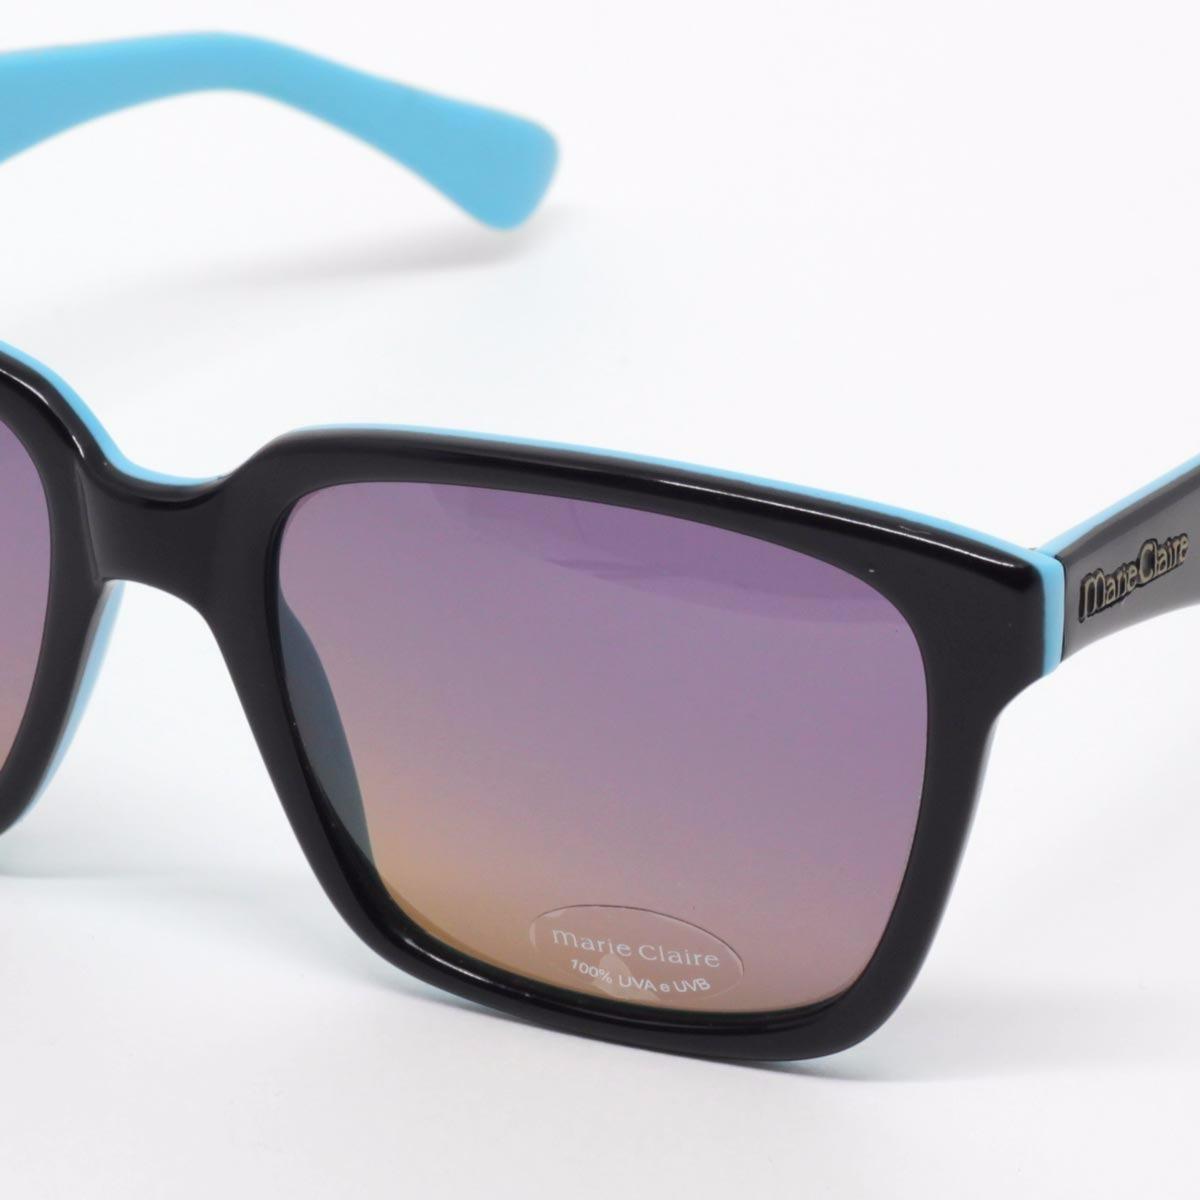 ae5f81d3144ca óculos de sol feminino - marie claire - azul. Carregando zoom.